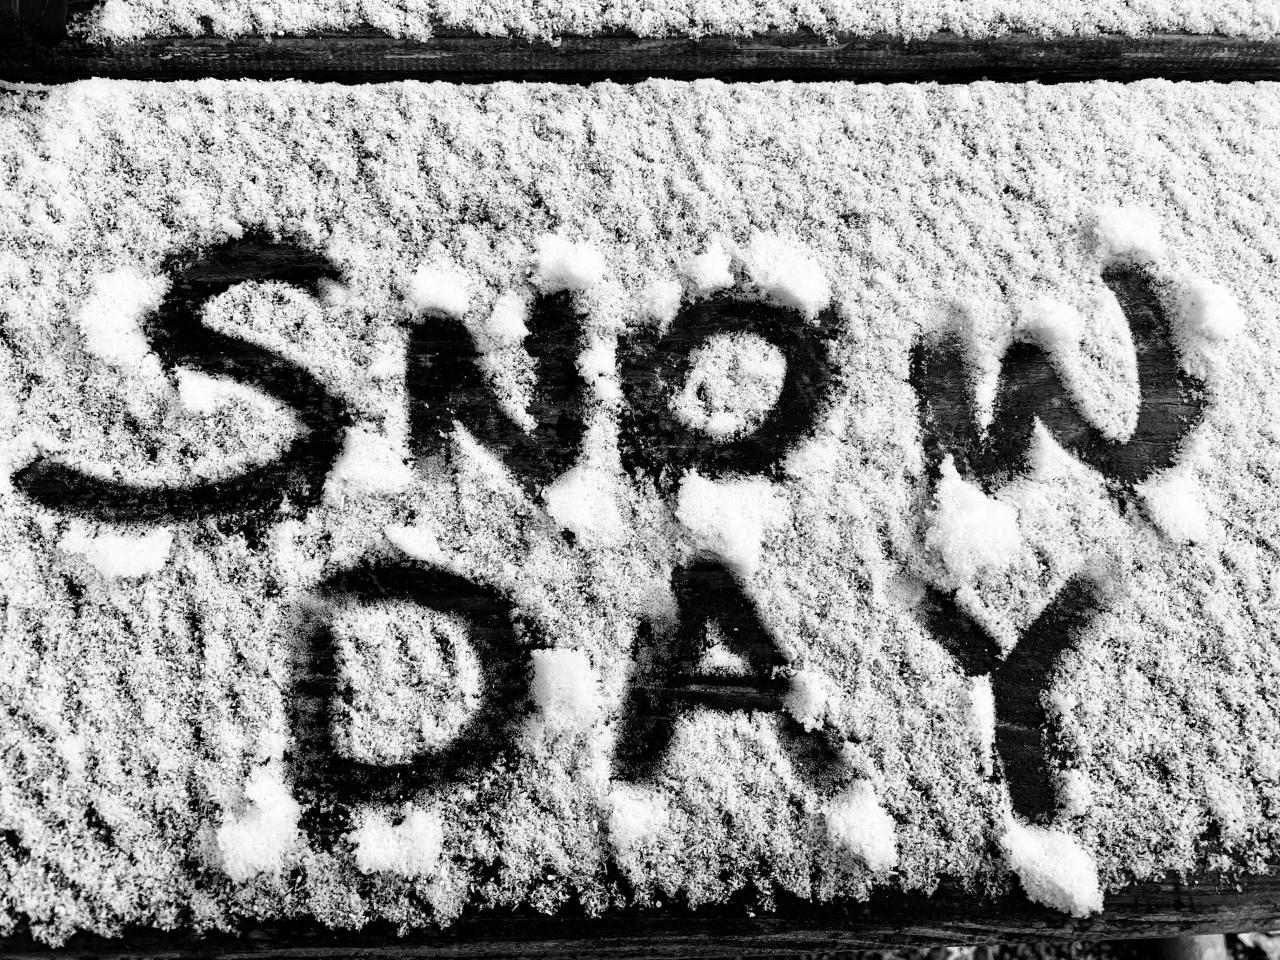 #13: Snow Day